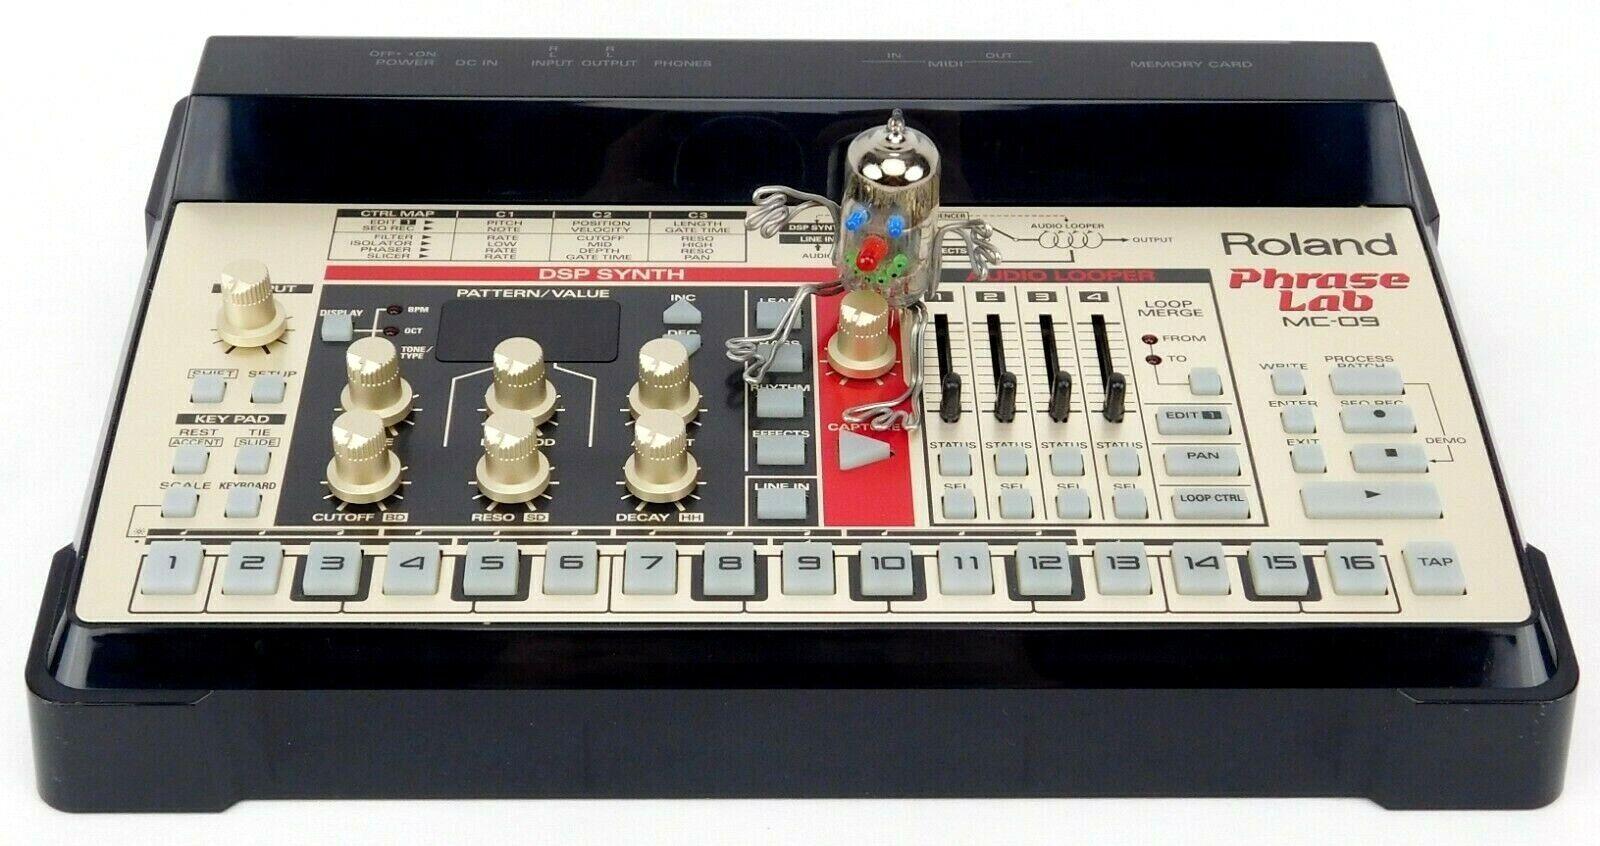 Roland MC-09 Phrase Lab DSP Synth Looper TB-303 Sounds + Top Zustand + Garantie